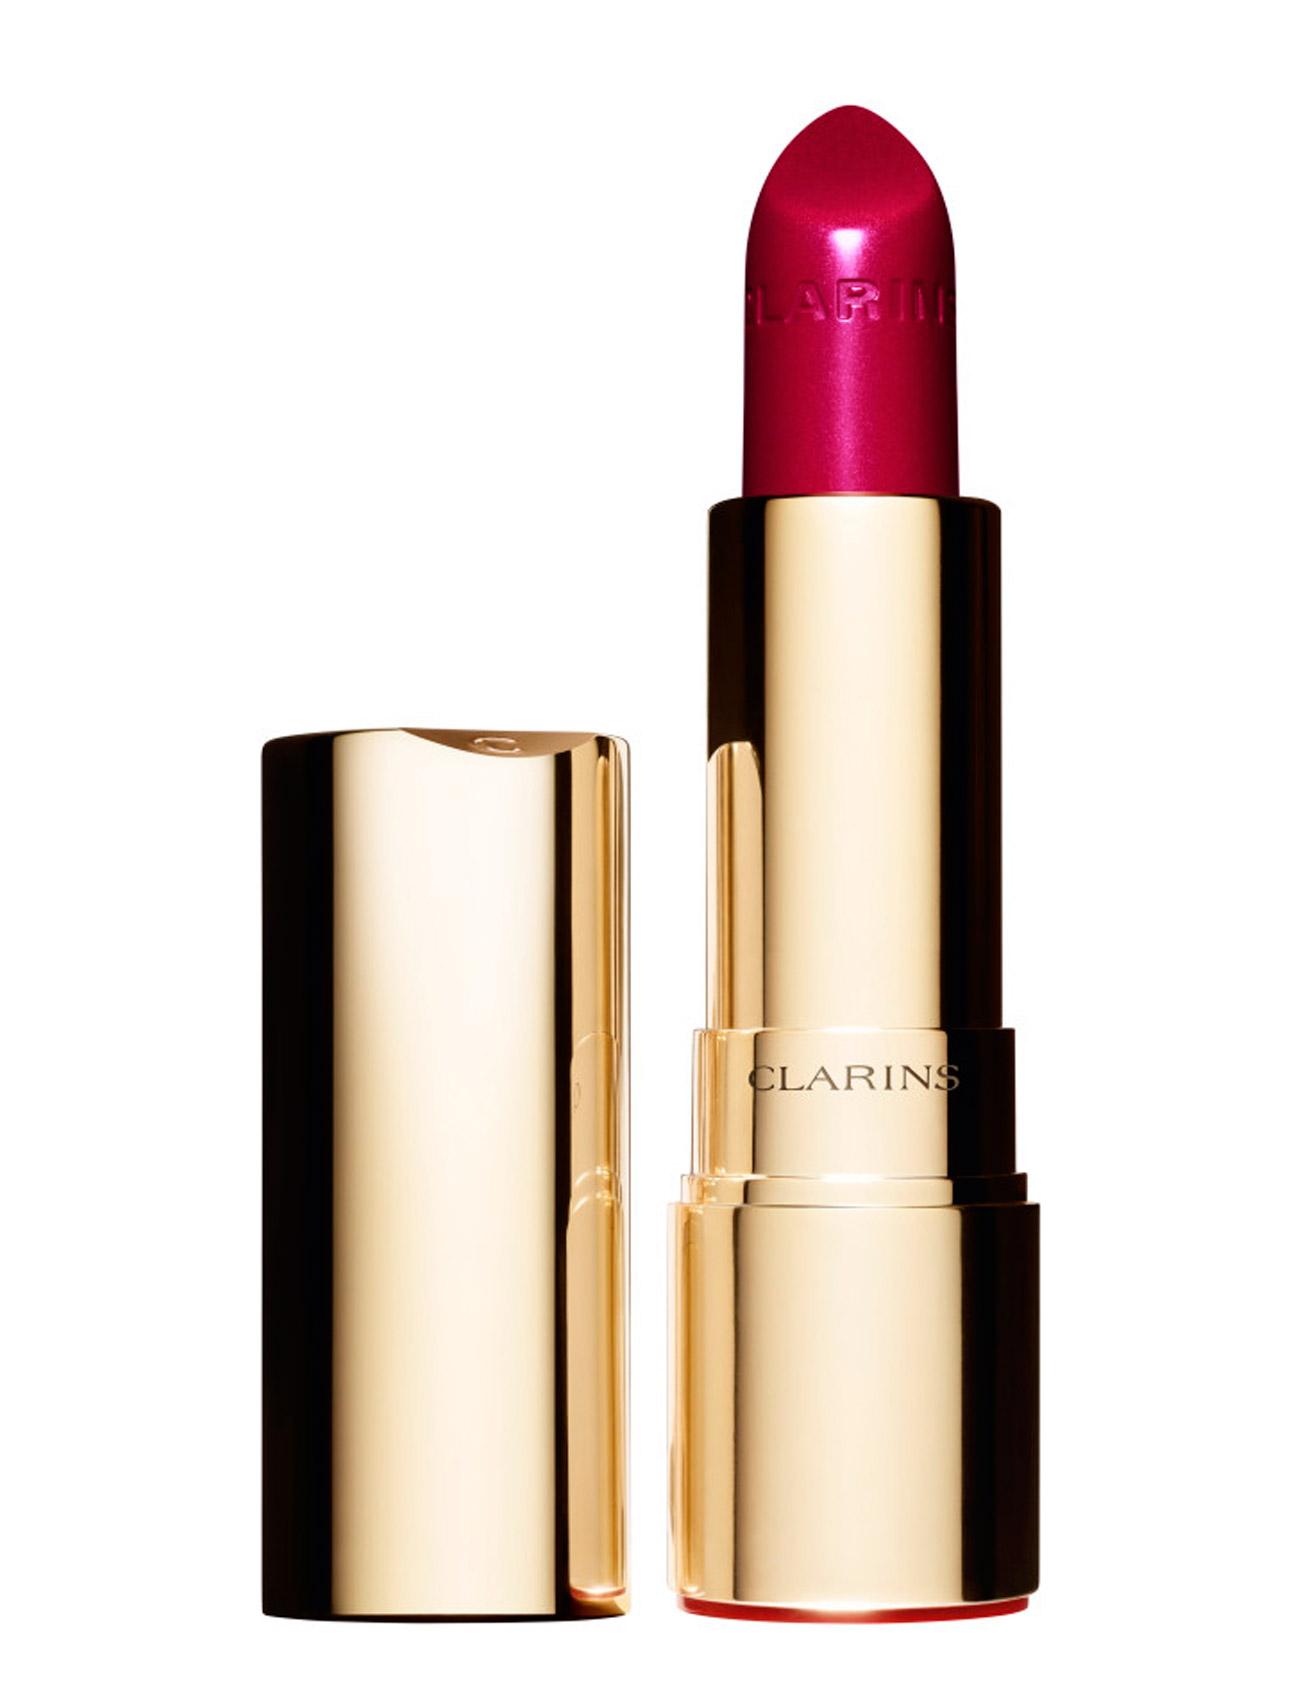 clarins Clarins joli rouge brillant 26 hibi fra boozt.com dk